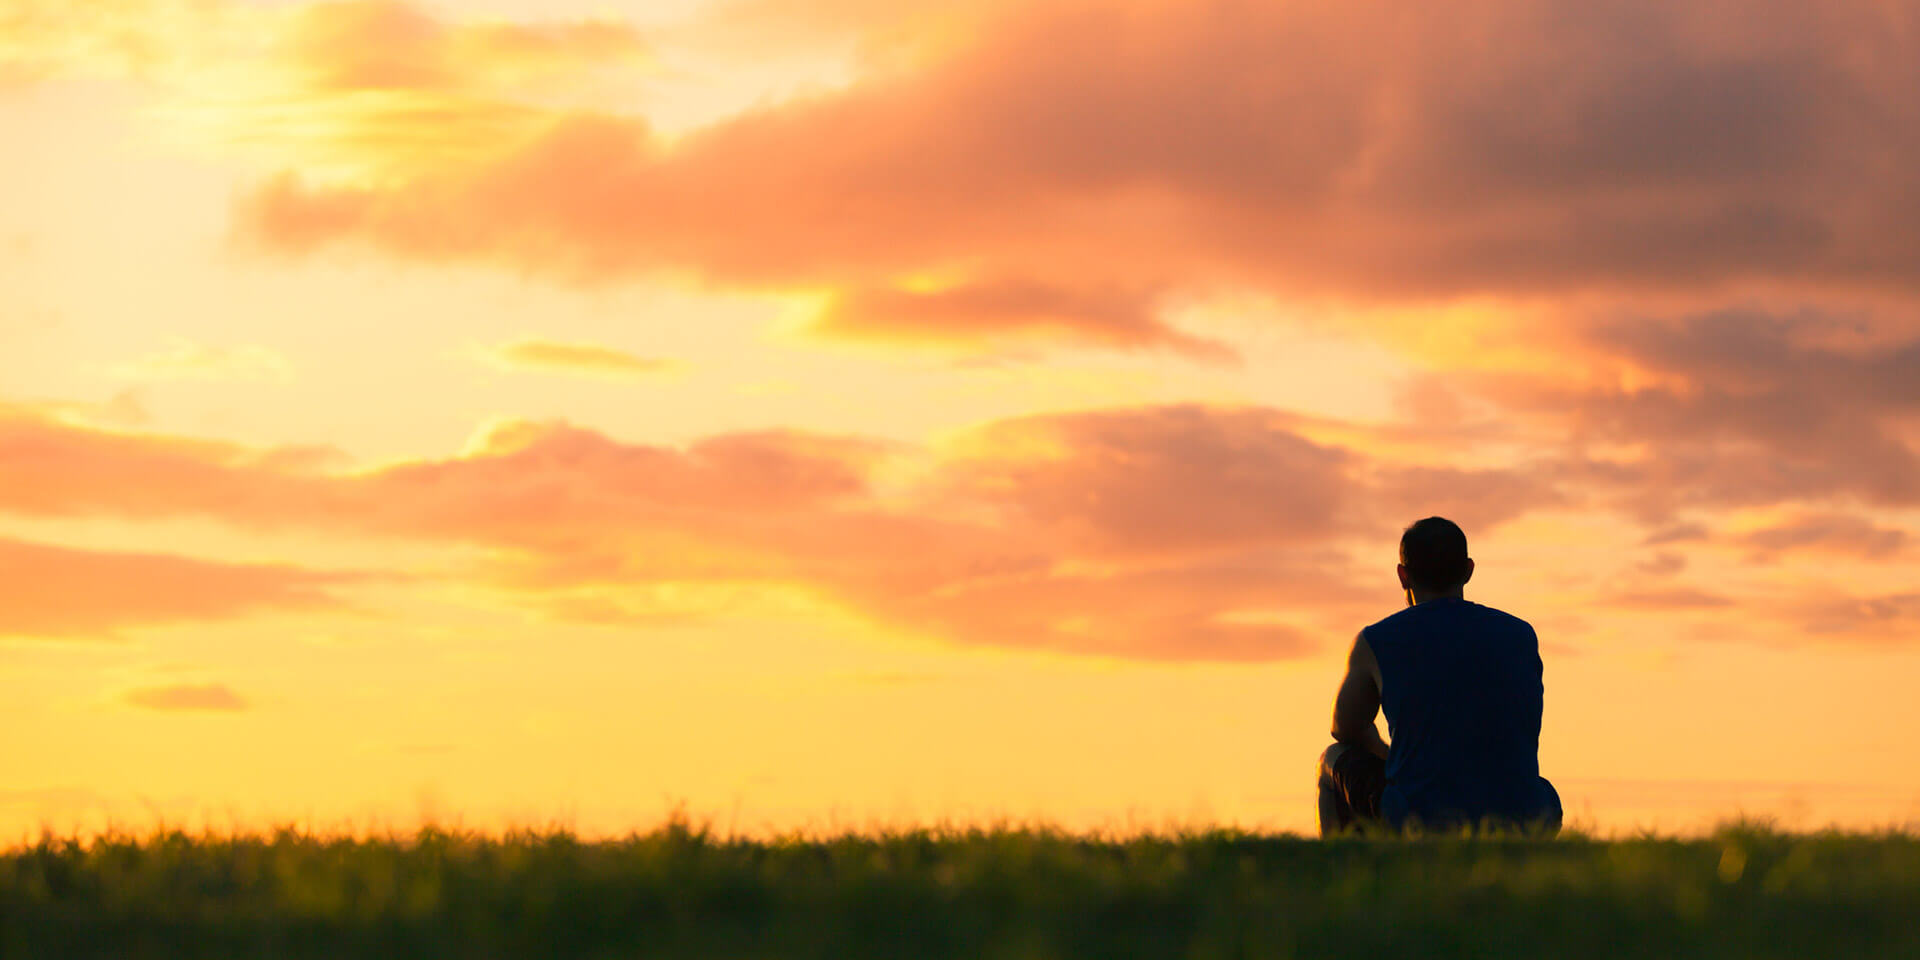 Mann am Strand im Sonnenuntergang